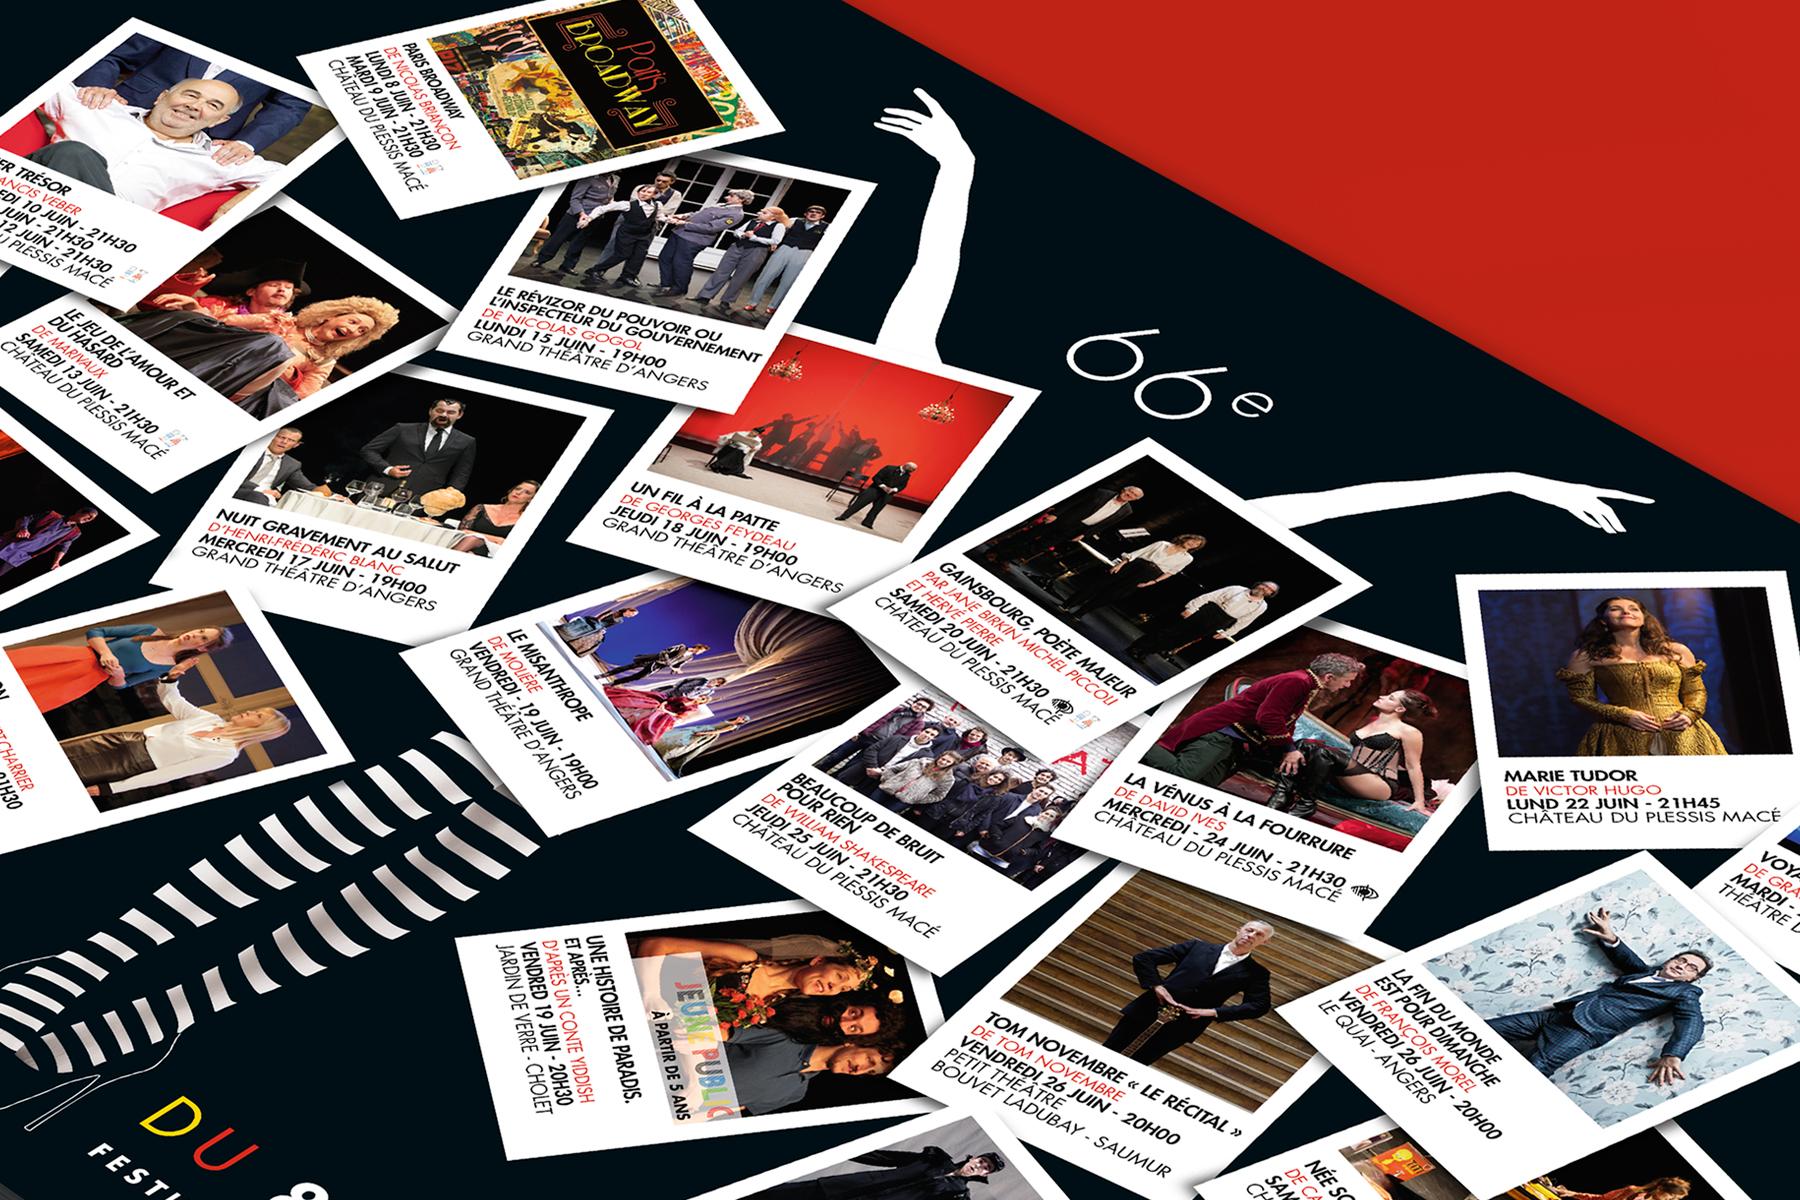 festival danjou 2015 6 carredelune